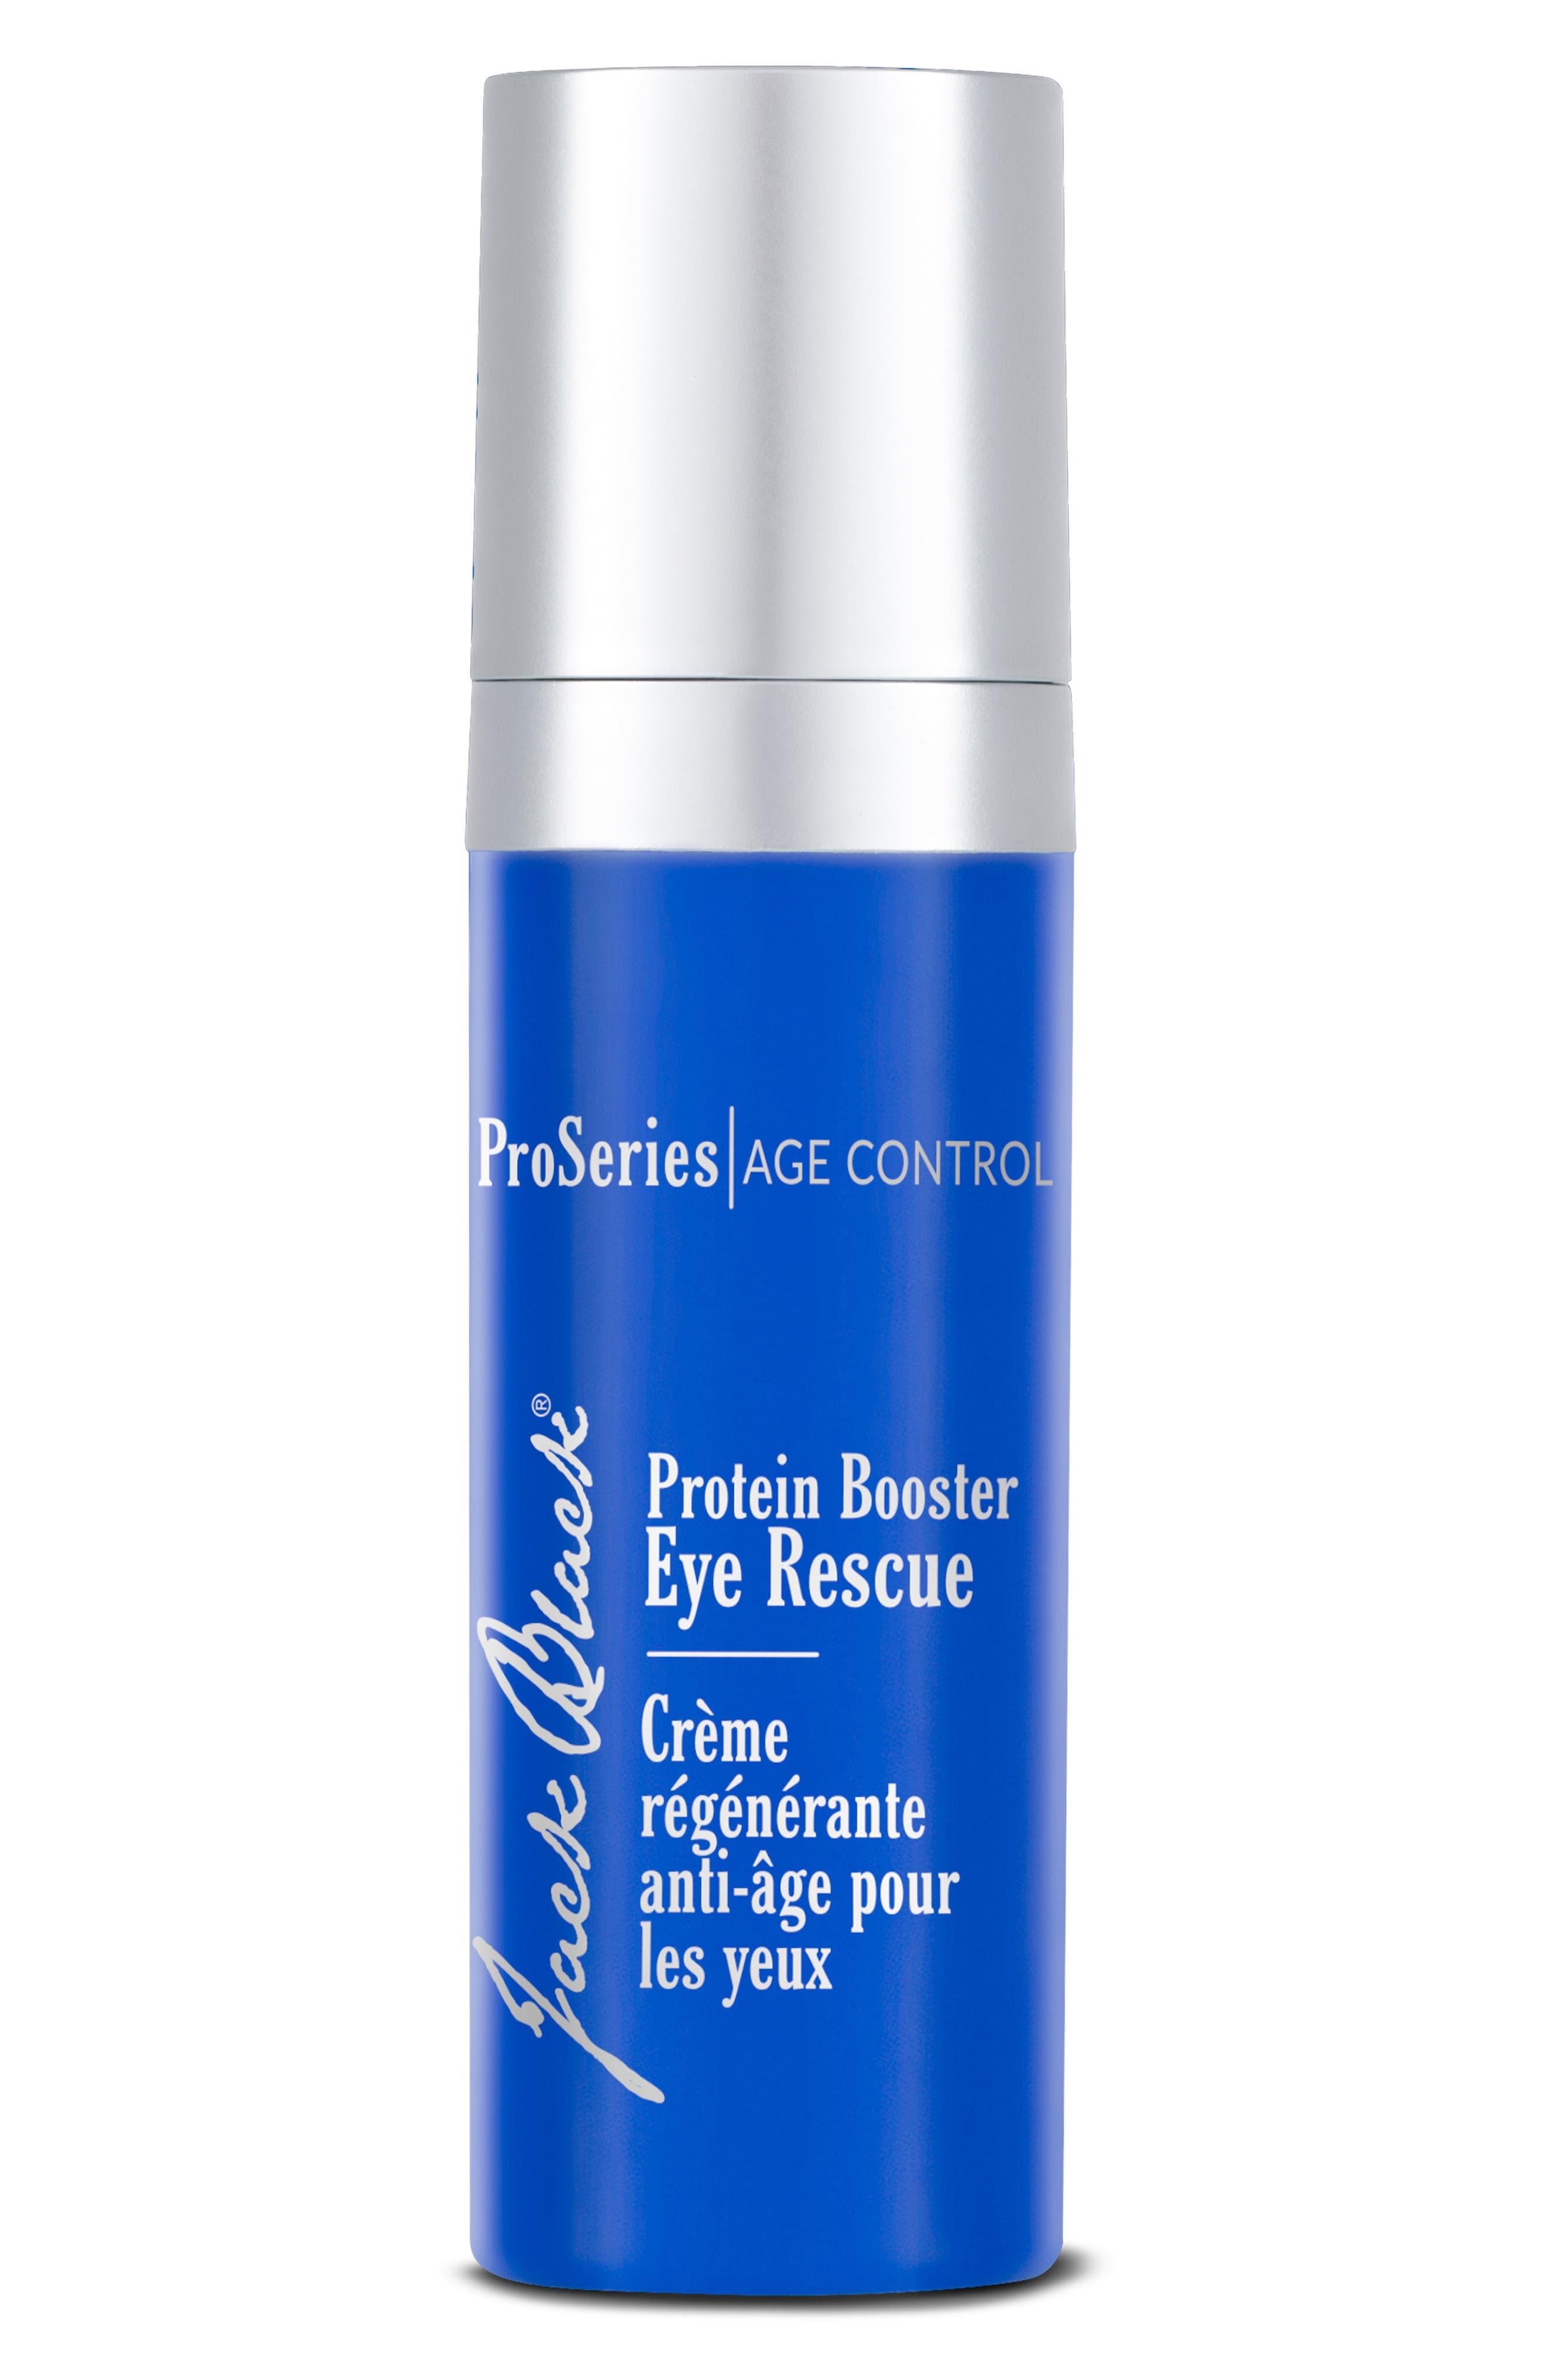 Protein Booster Eye Rescue Eye Cream